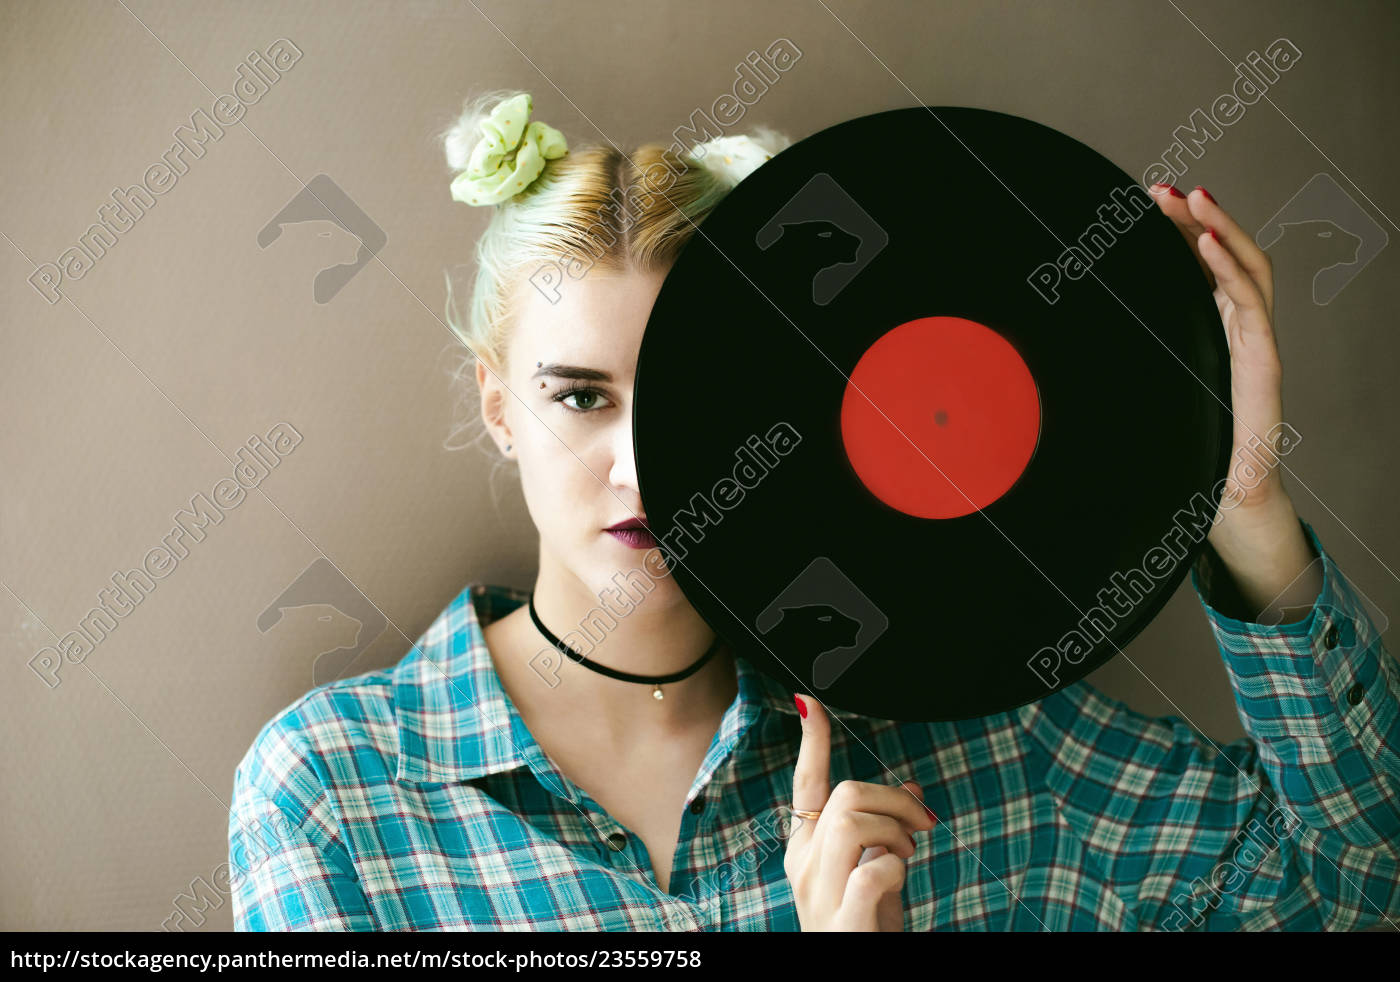 kobieta, z, płytą., młoda, piękna, hipsterka - 23559758